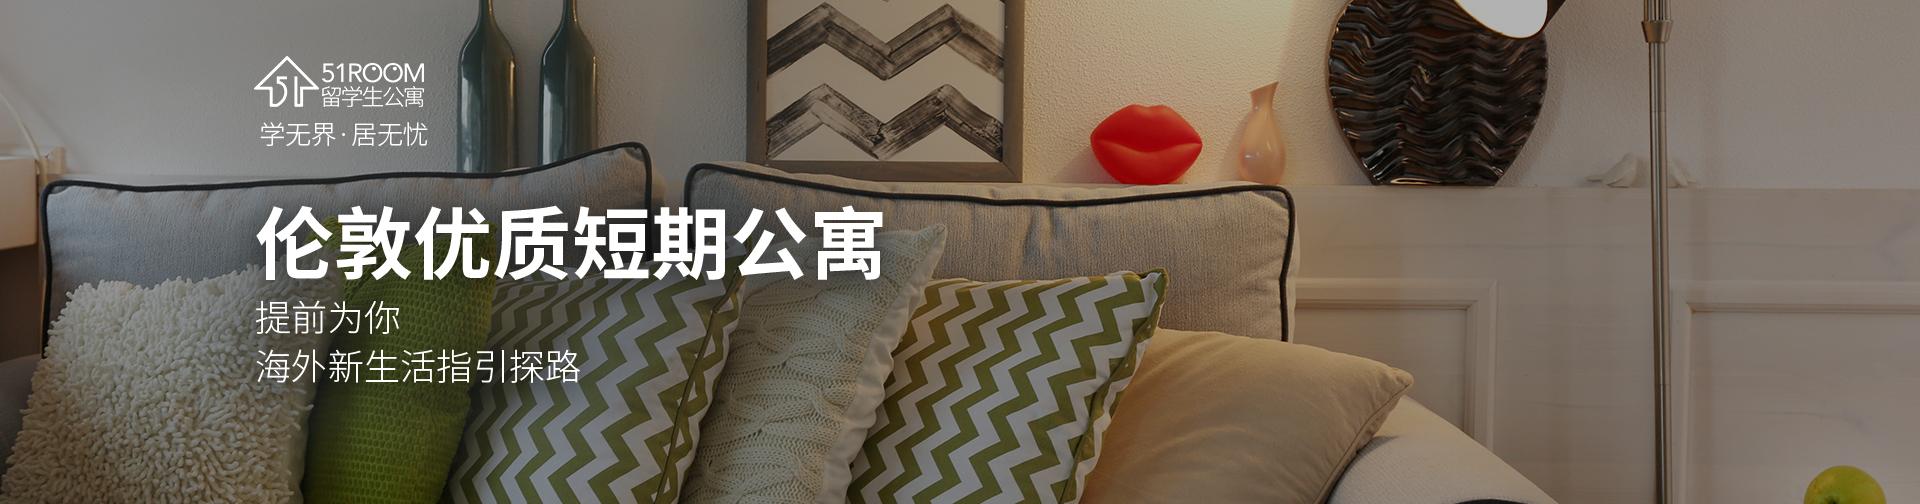 https://img.myoffer.cn/fm/bryan/banner/shouye/51room活动0619pc.jpg